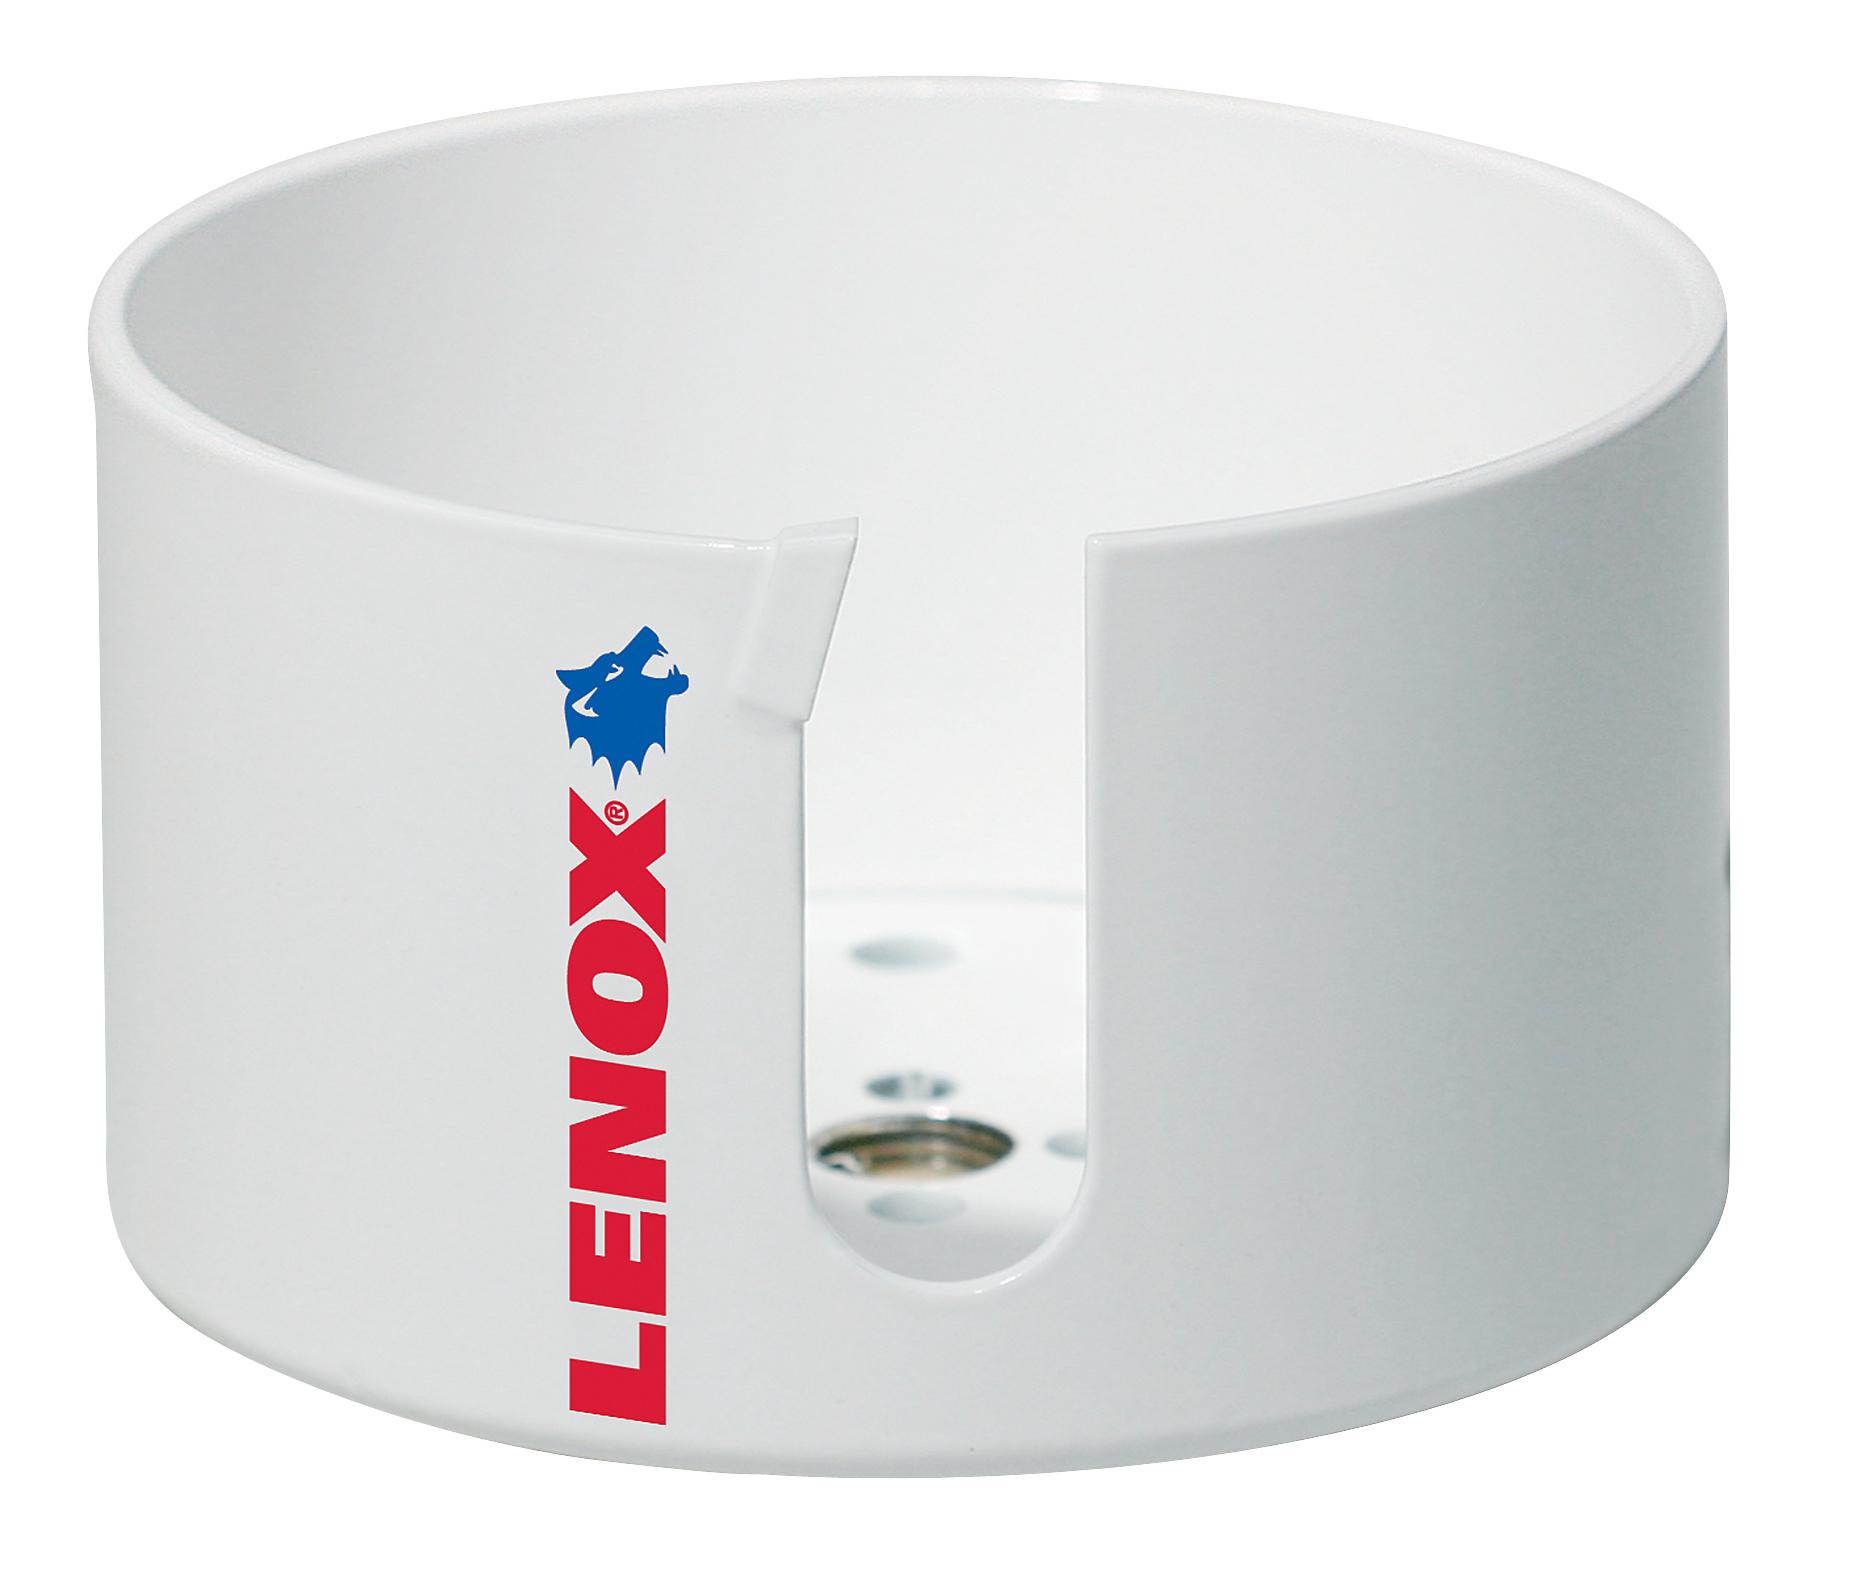 LENOX,2548787HC,HOLE CUTTER 87HC 5 1/2